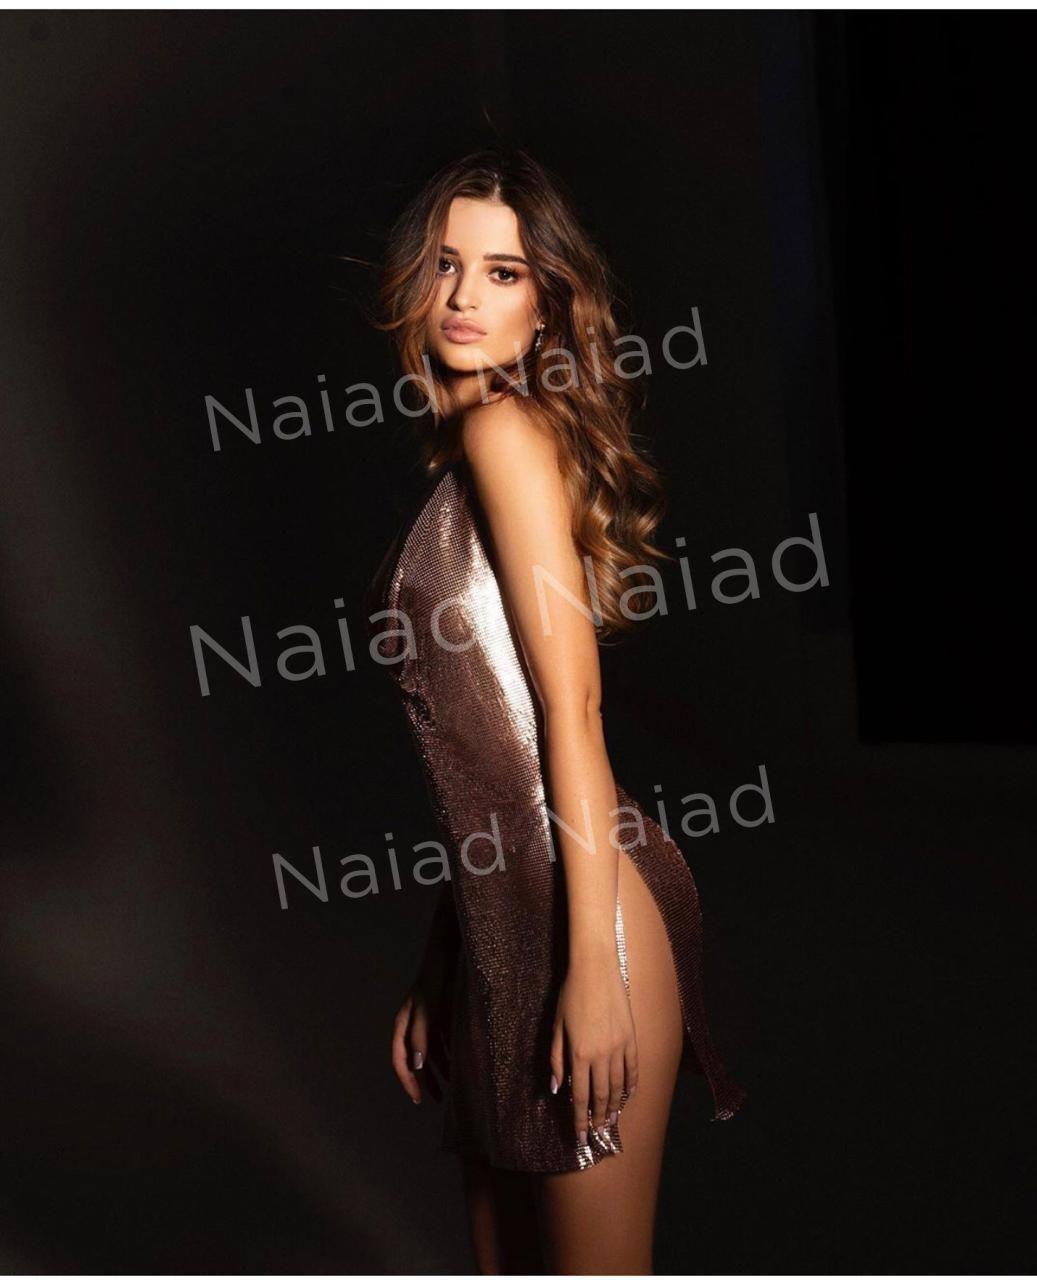 Photo of Claire_naiad on Naiad vip escort service in Paris